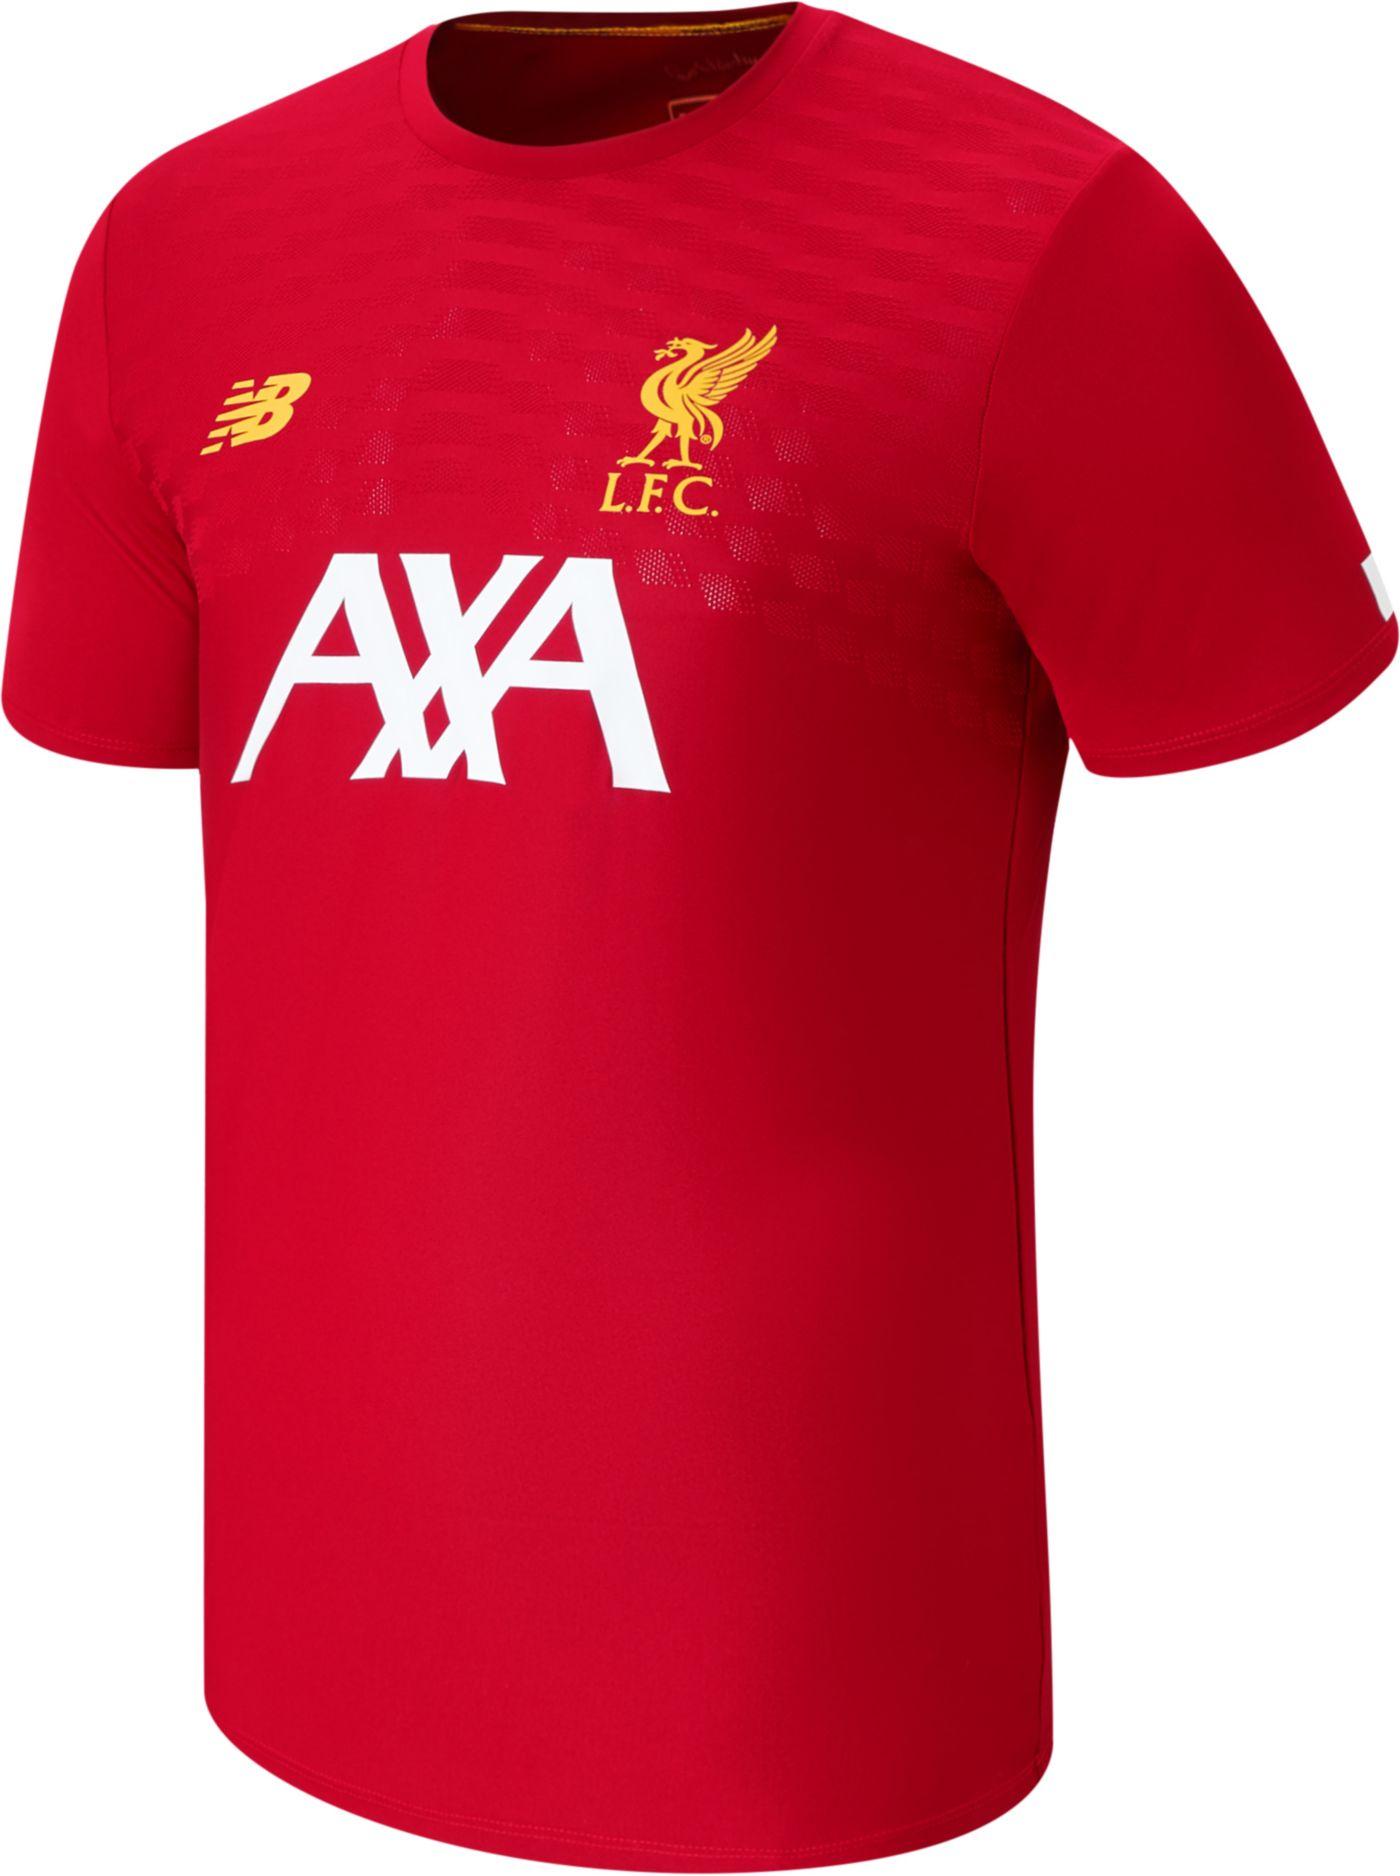 New Balance Men's Liverpool Prematch Red Shirt